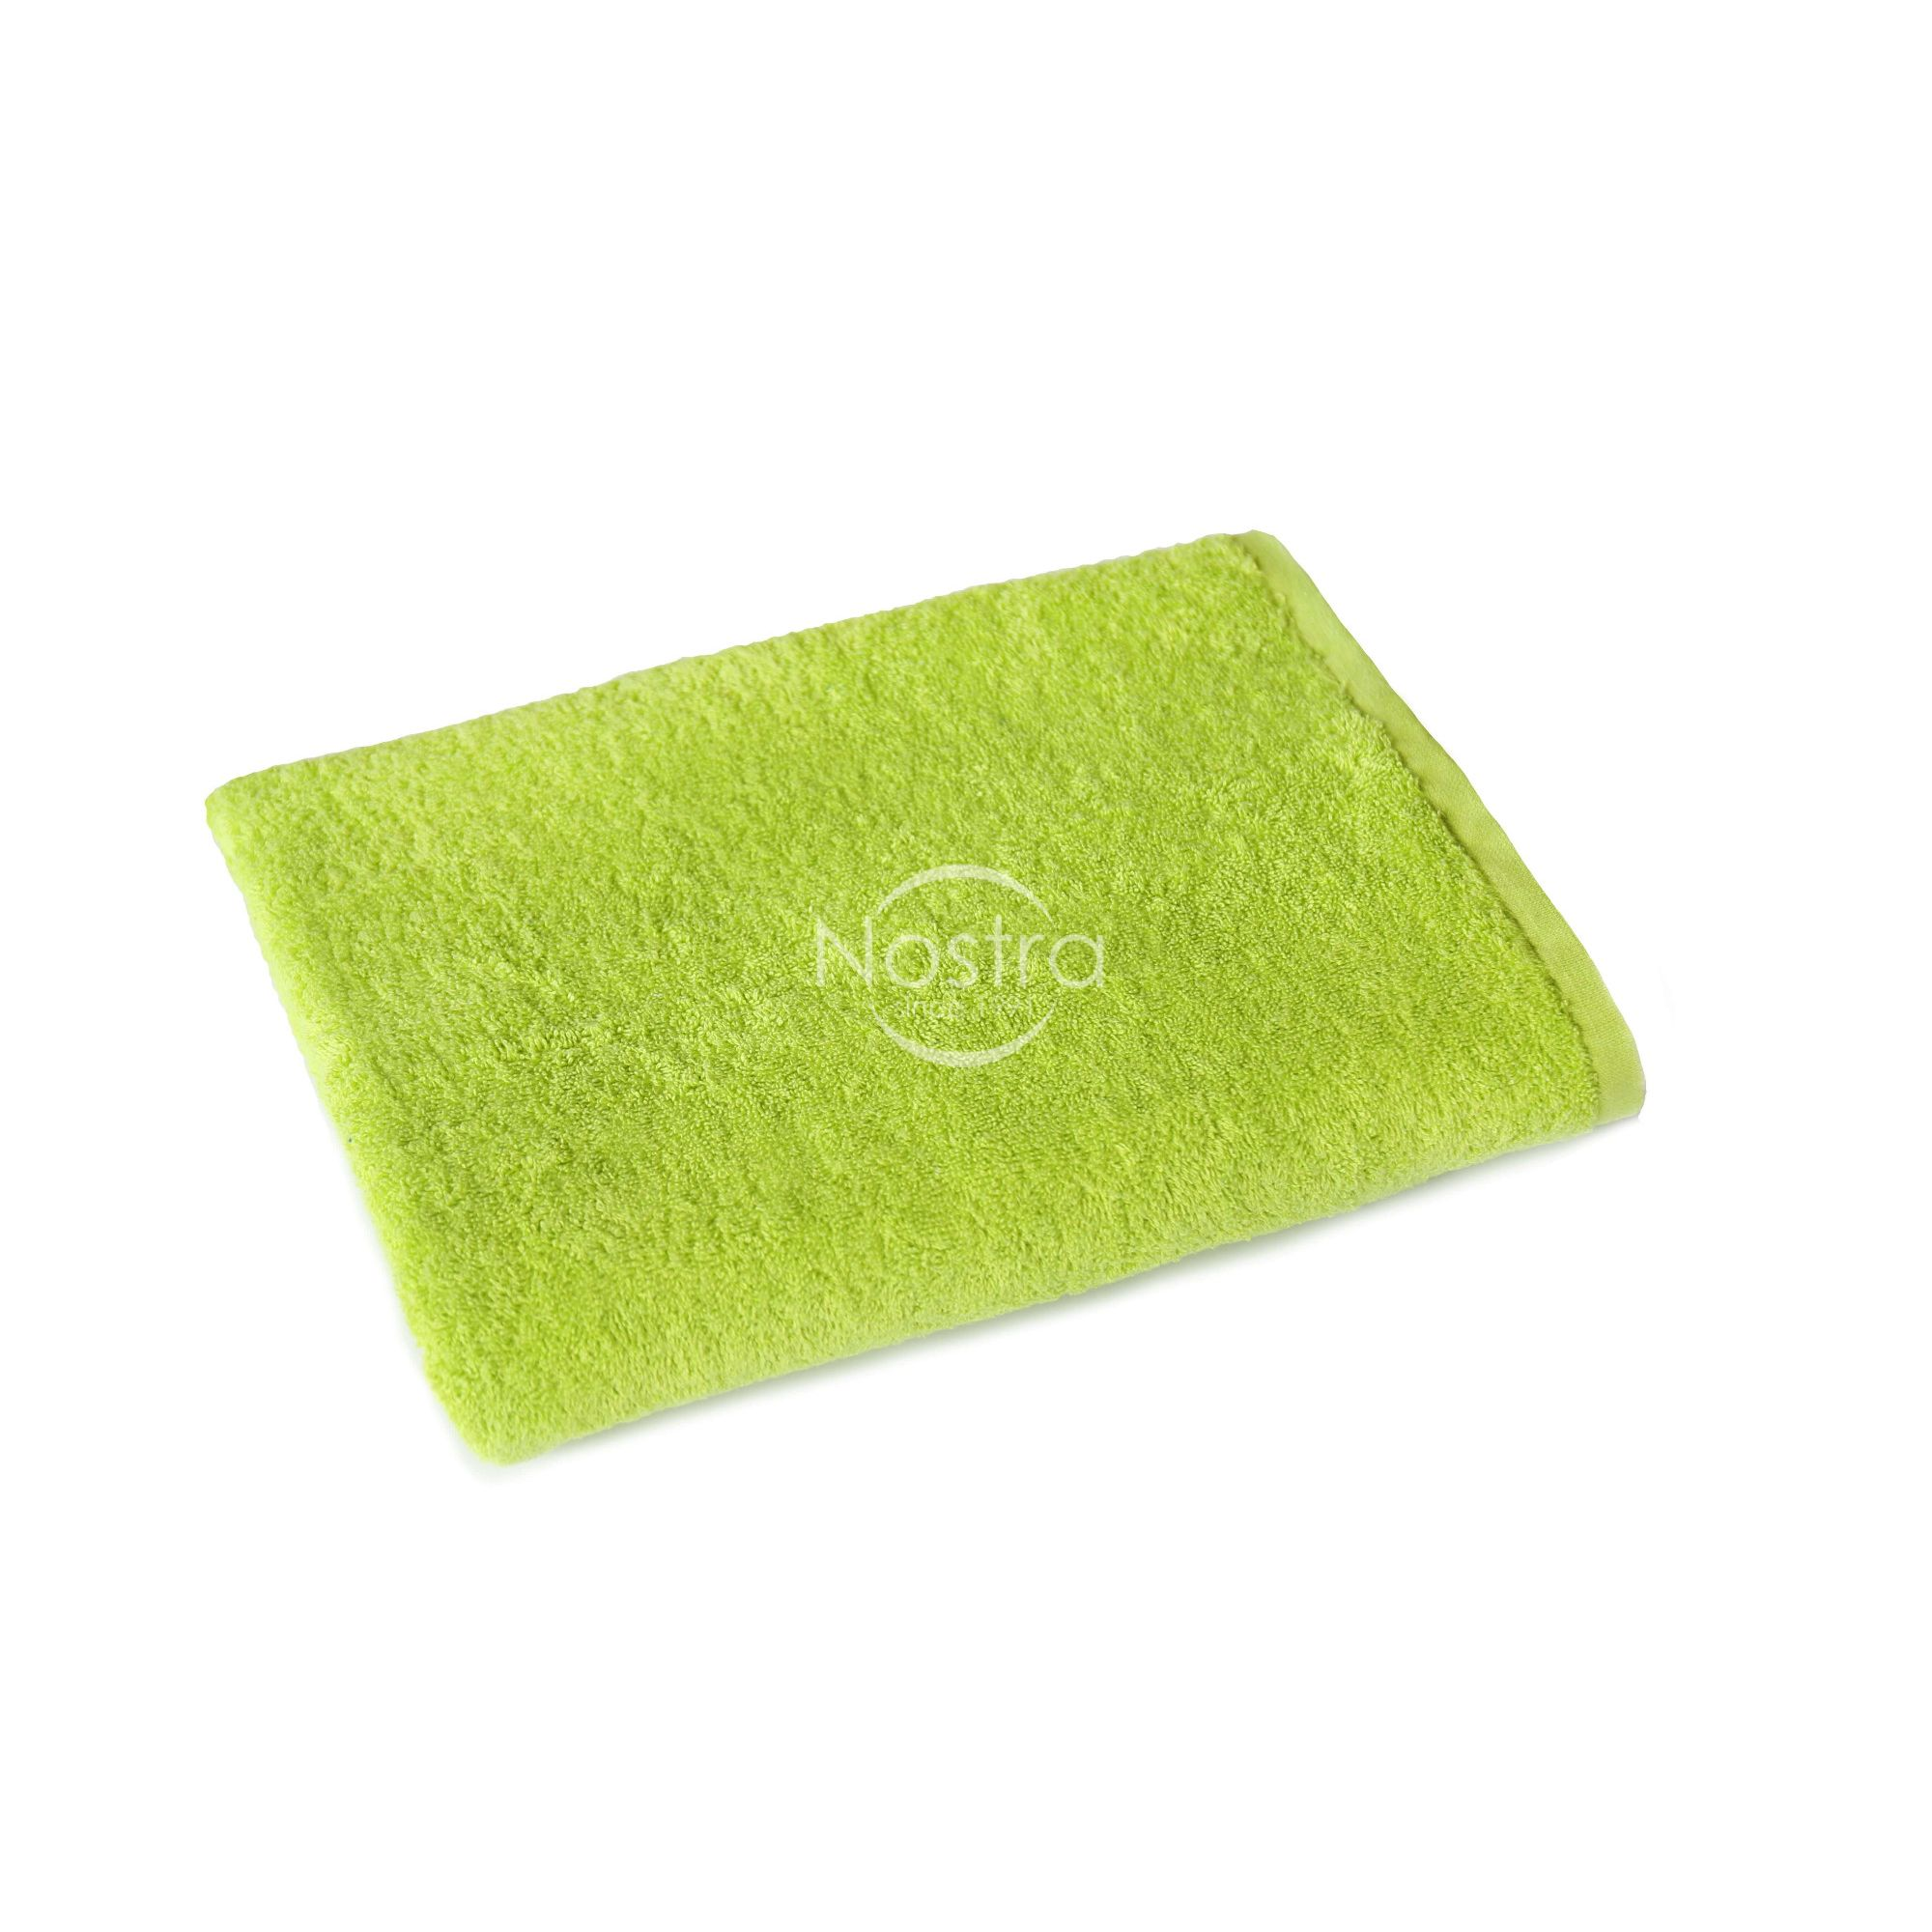 Towels 430 g/m2